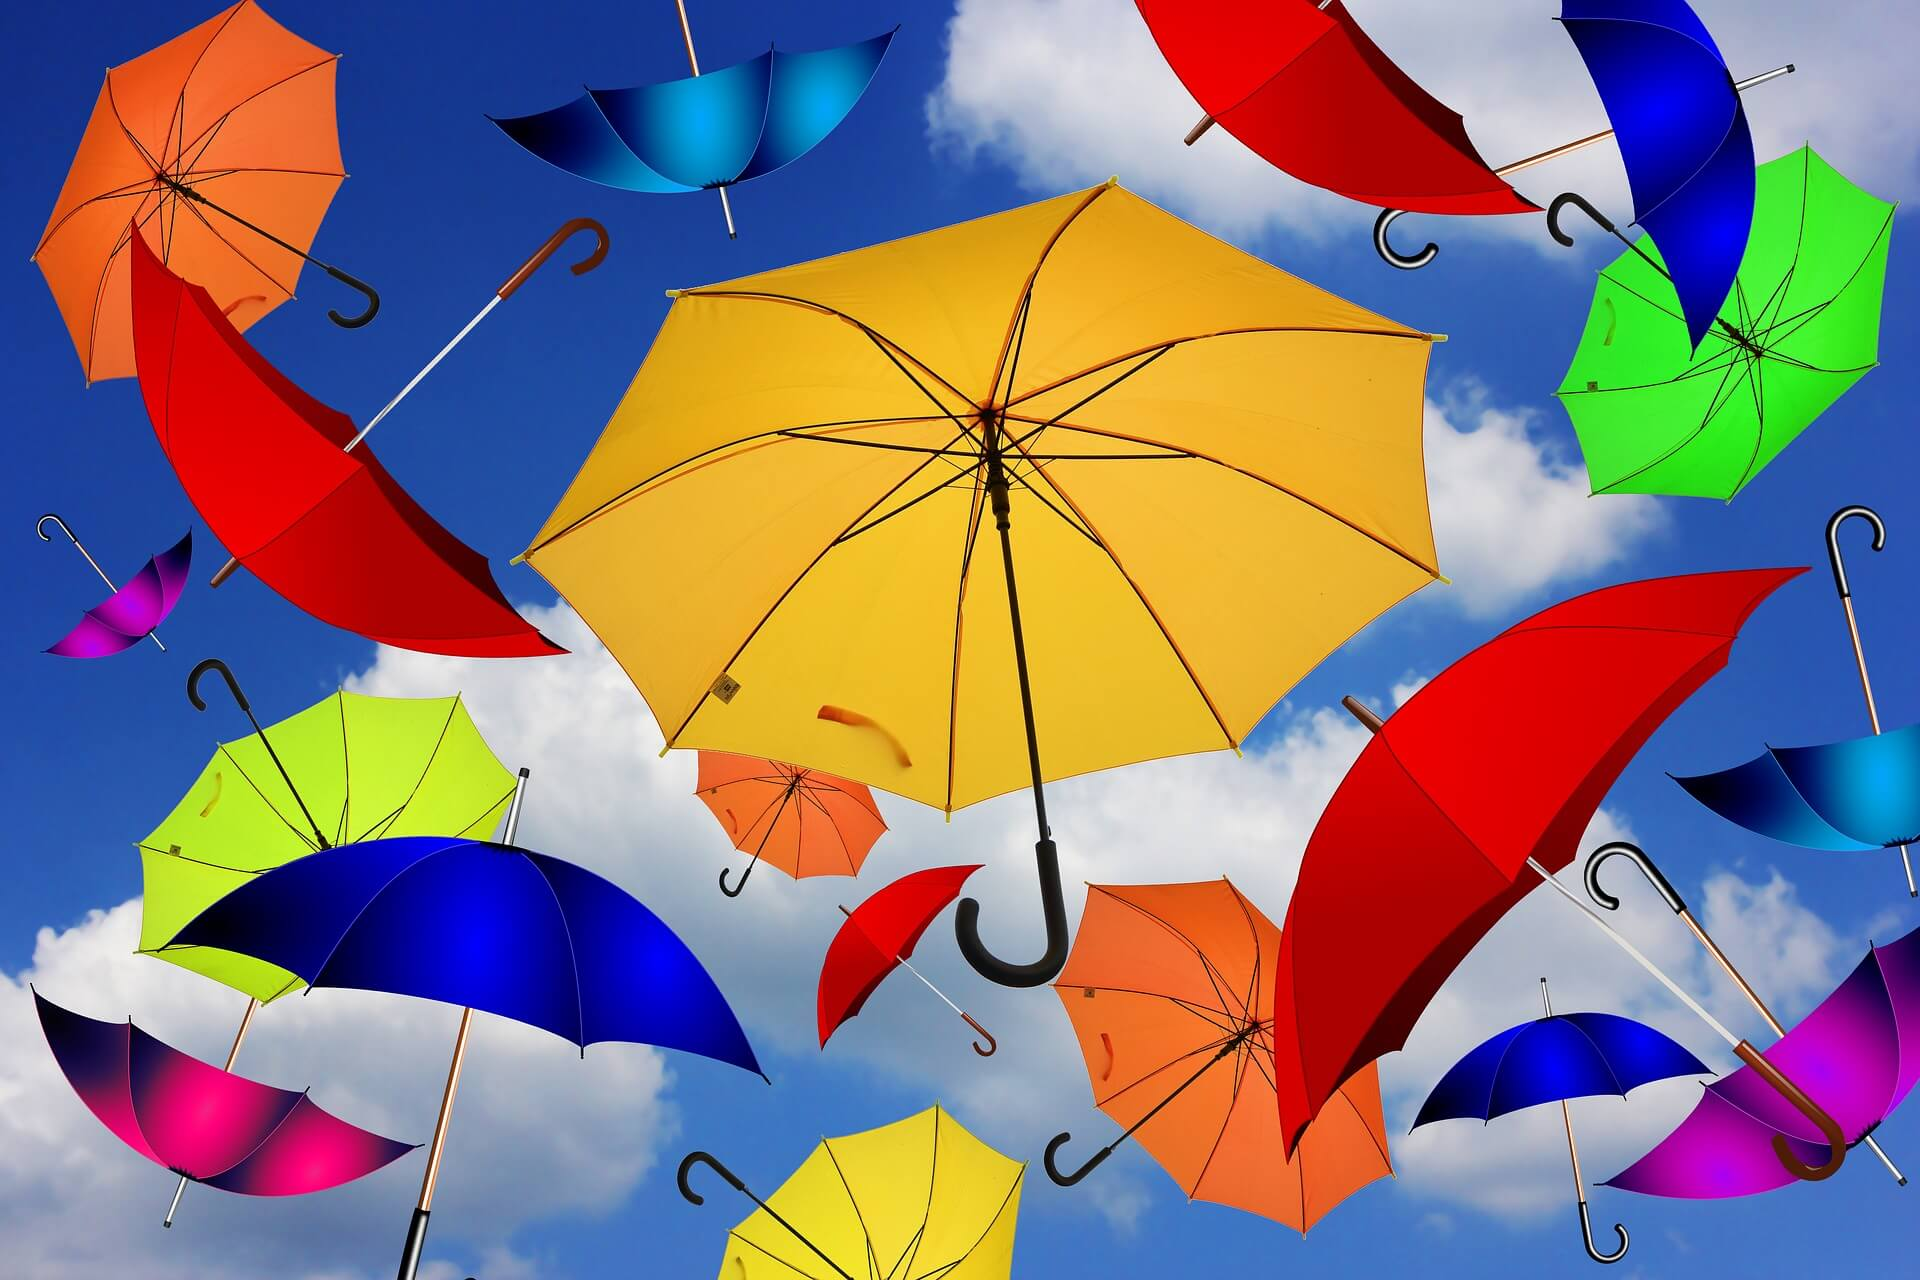 Viele bunte Regenschirme. Bild zum Regenschirm-Tag